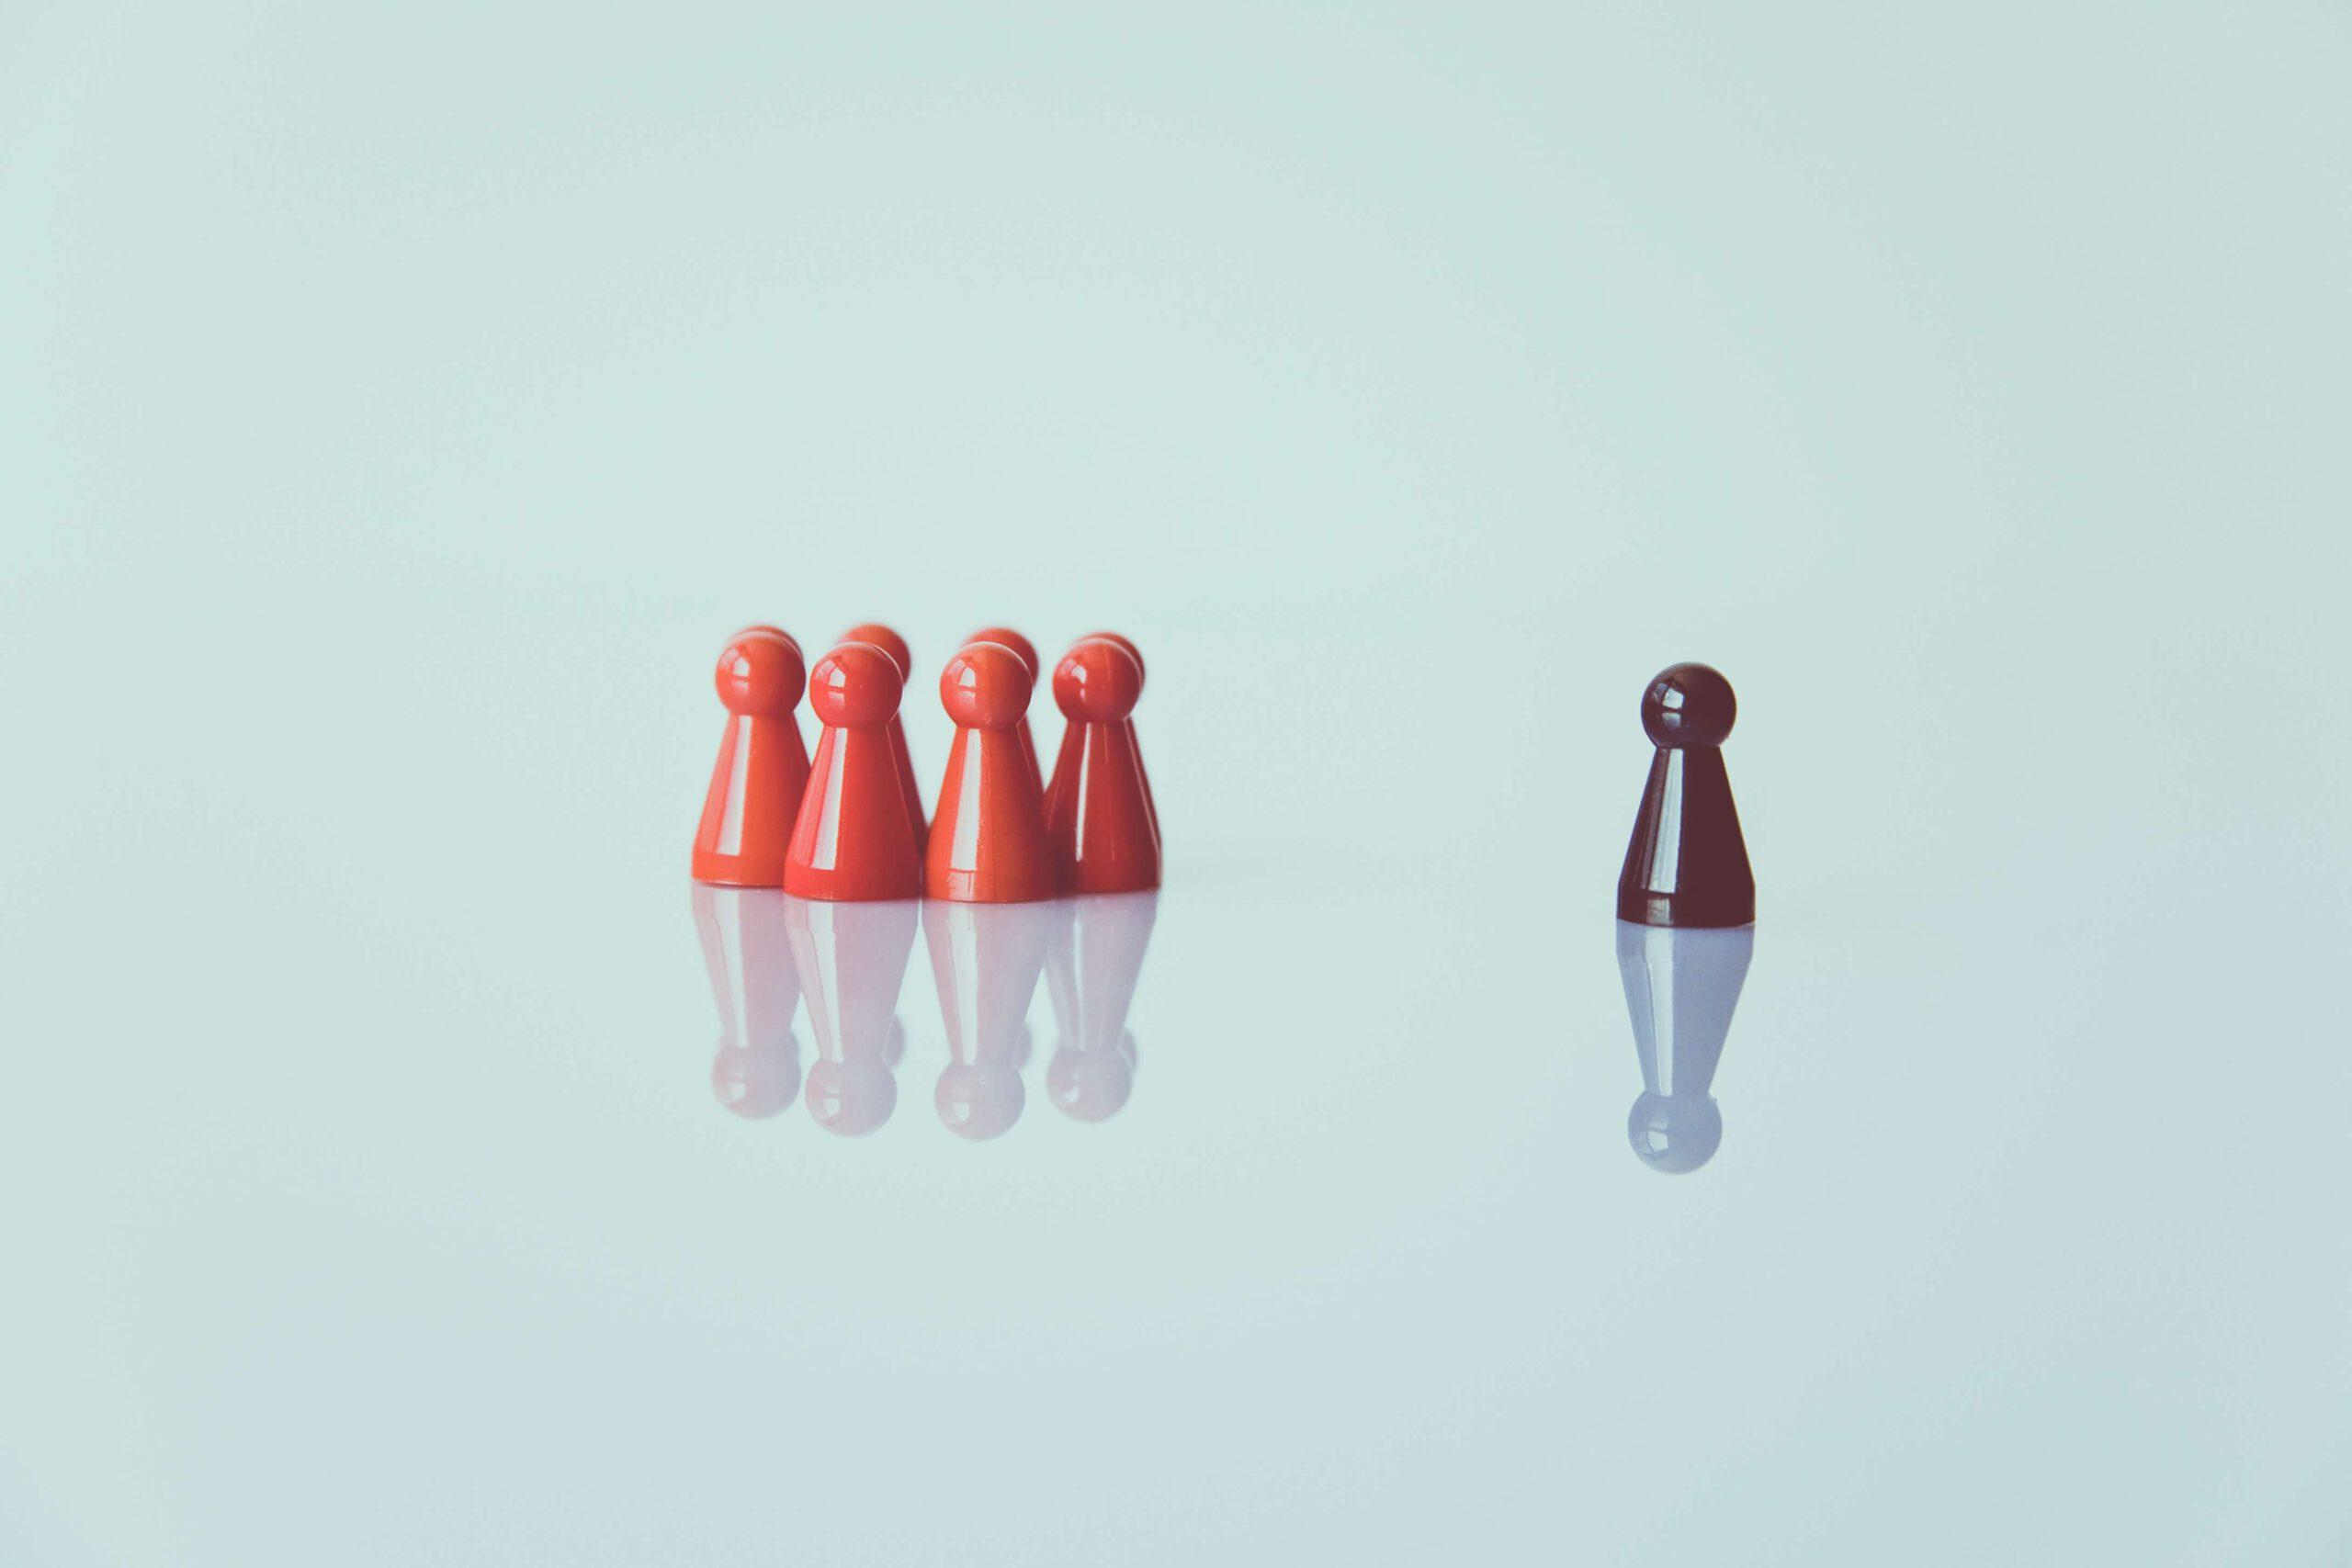 6x hoe word ik kennisleider in mijn vakgebied?